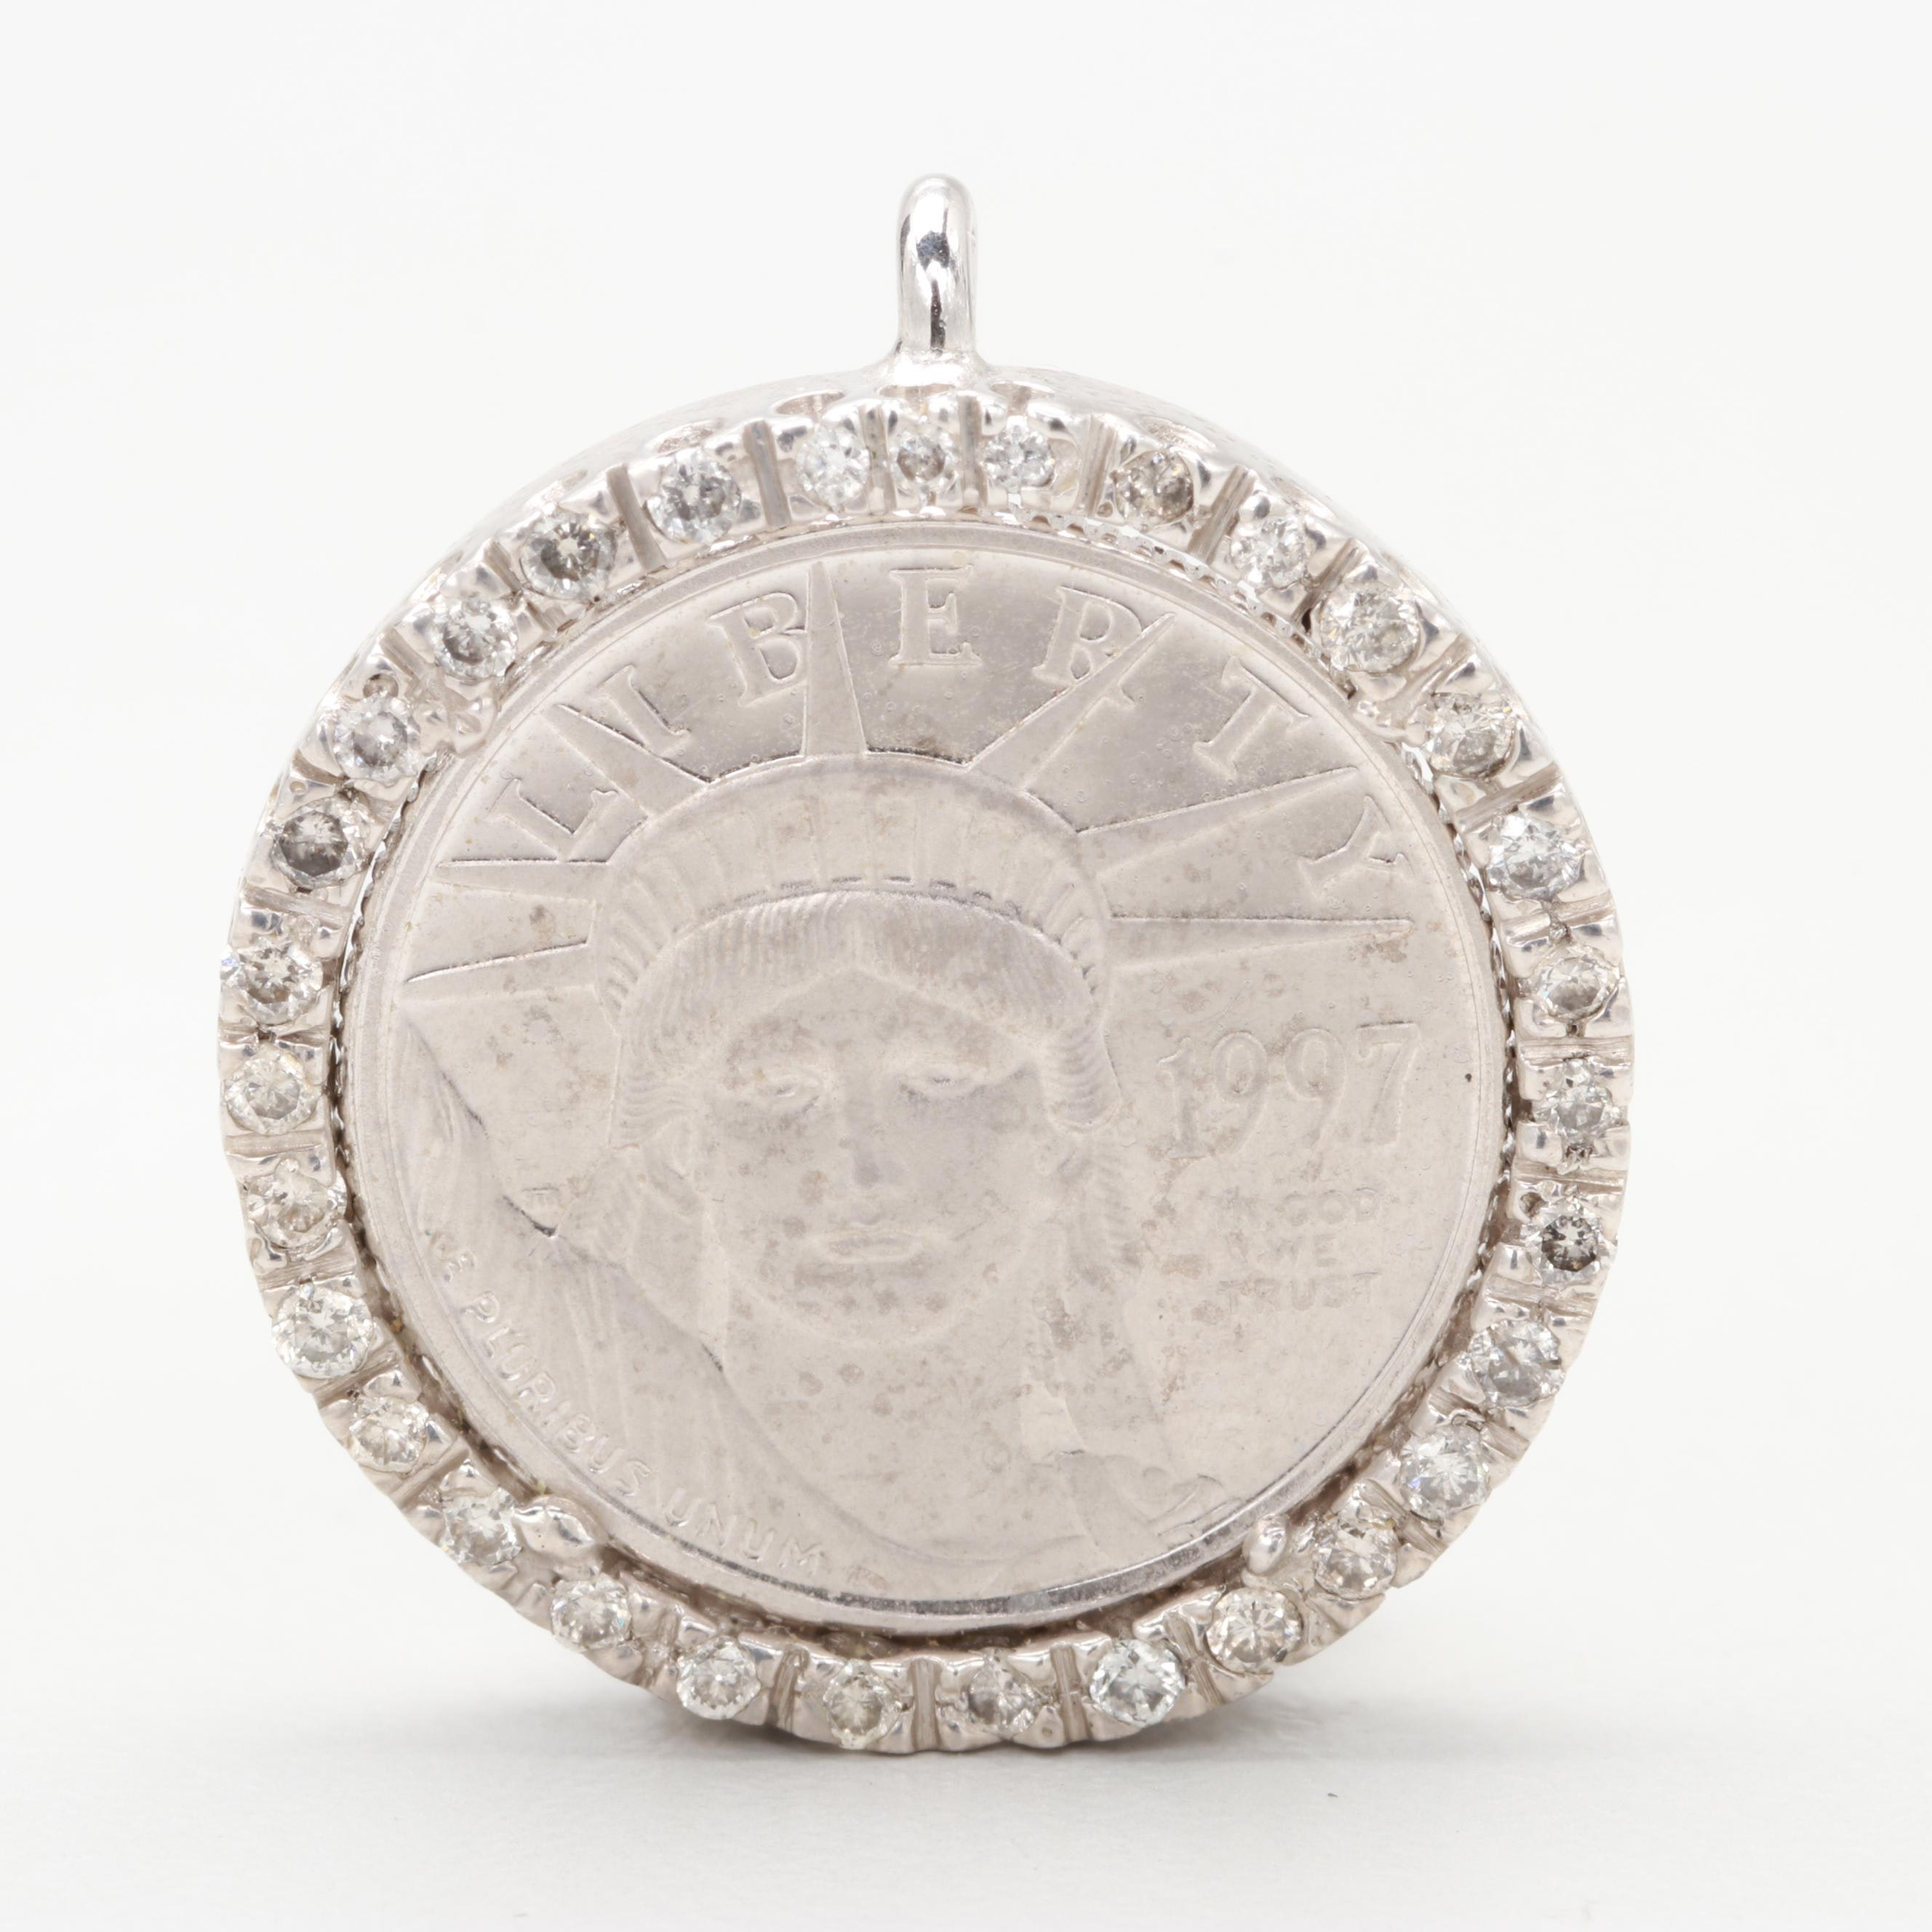 14K White Gold Diamond Pendant with a 1997-W $10 Platinum Eagle Bullion Coin